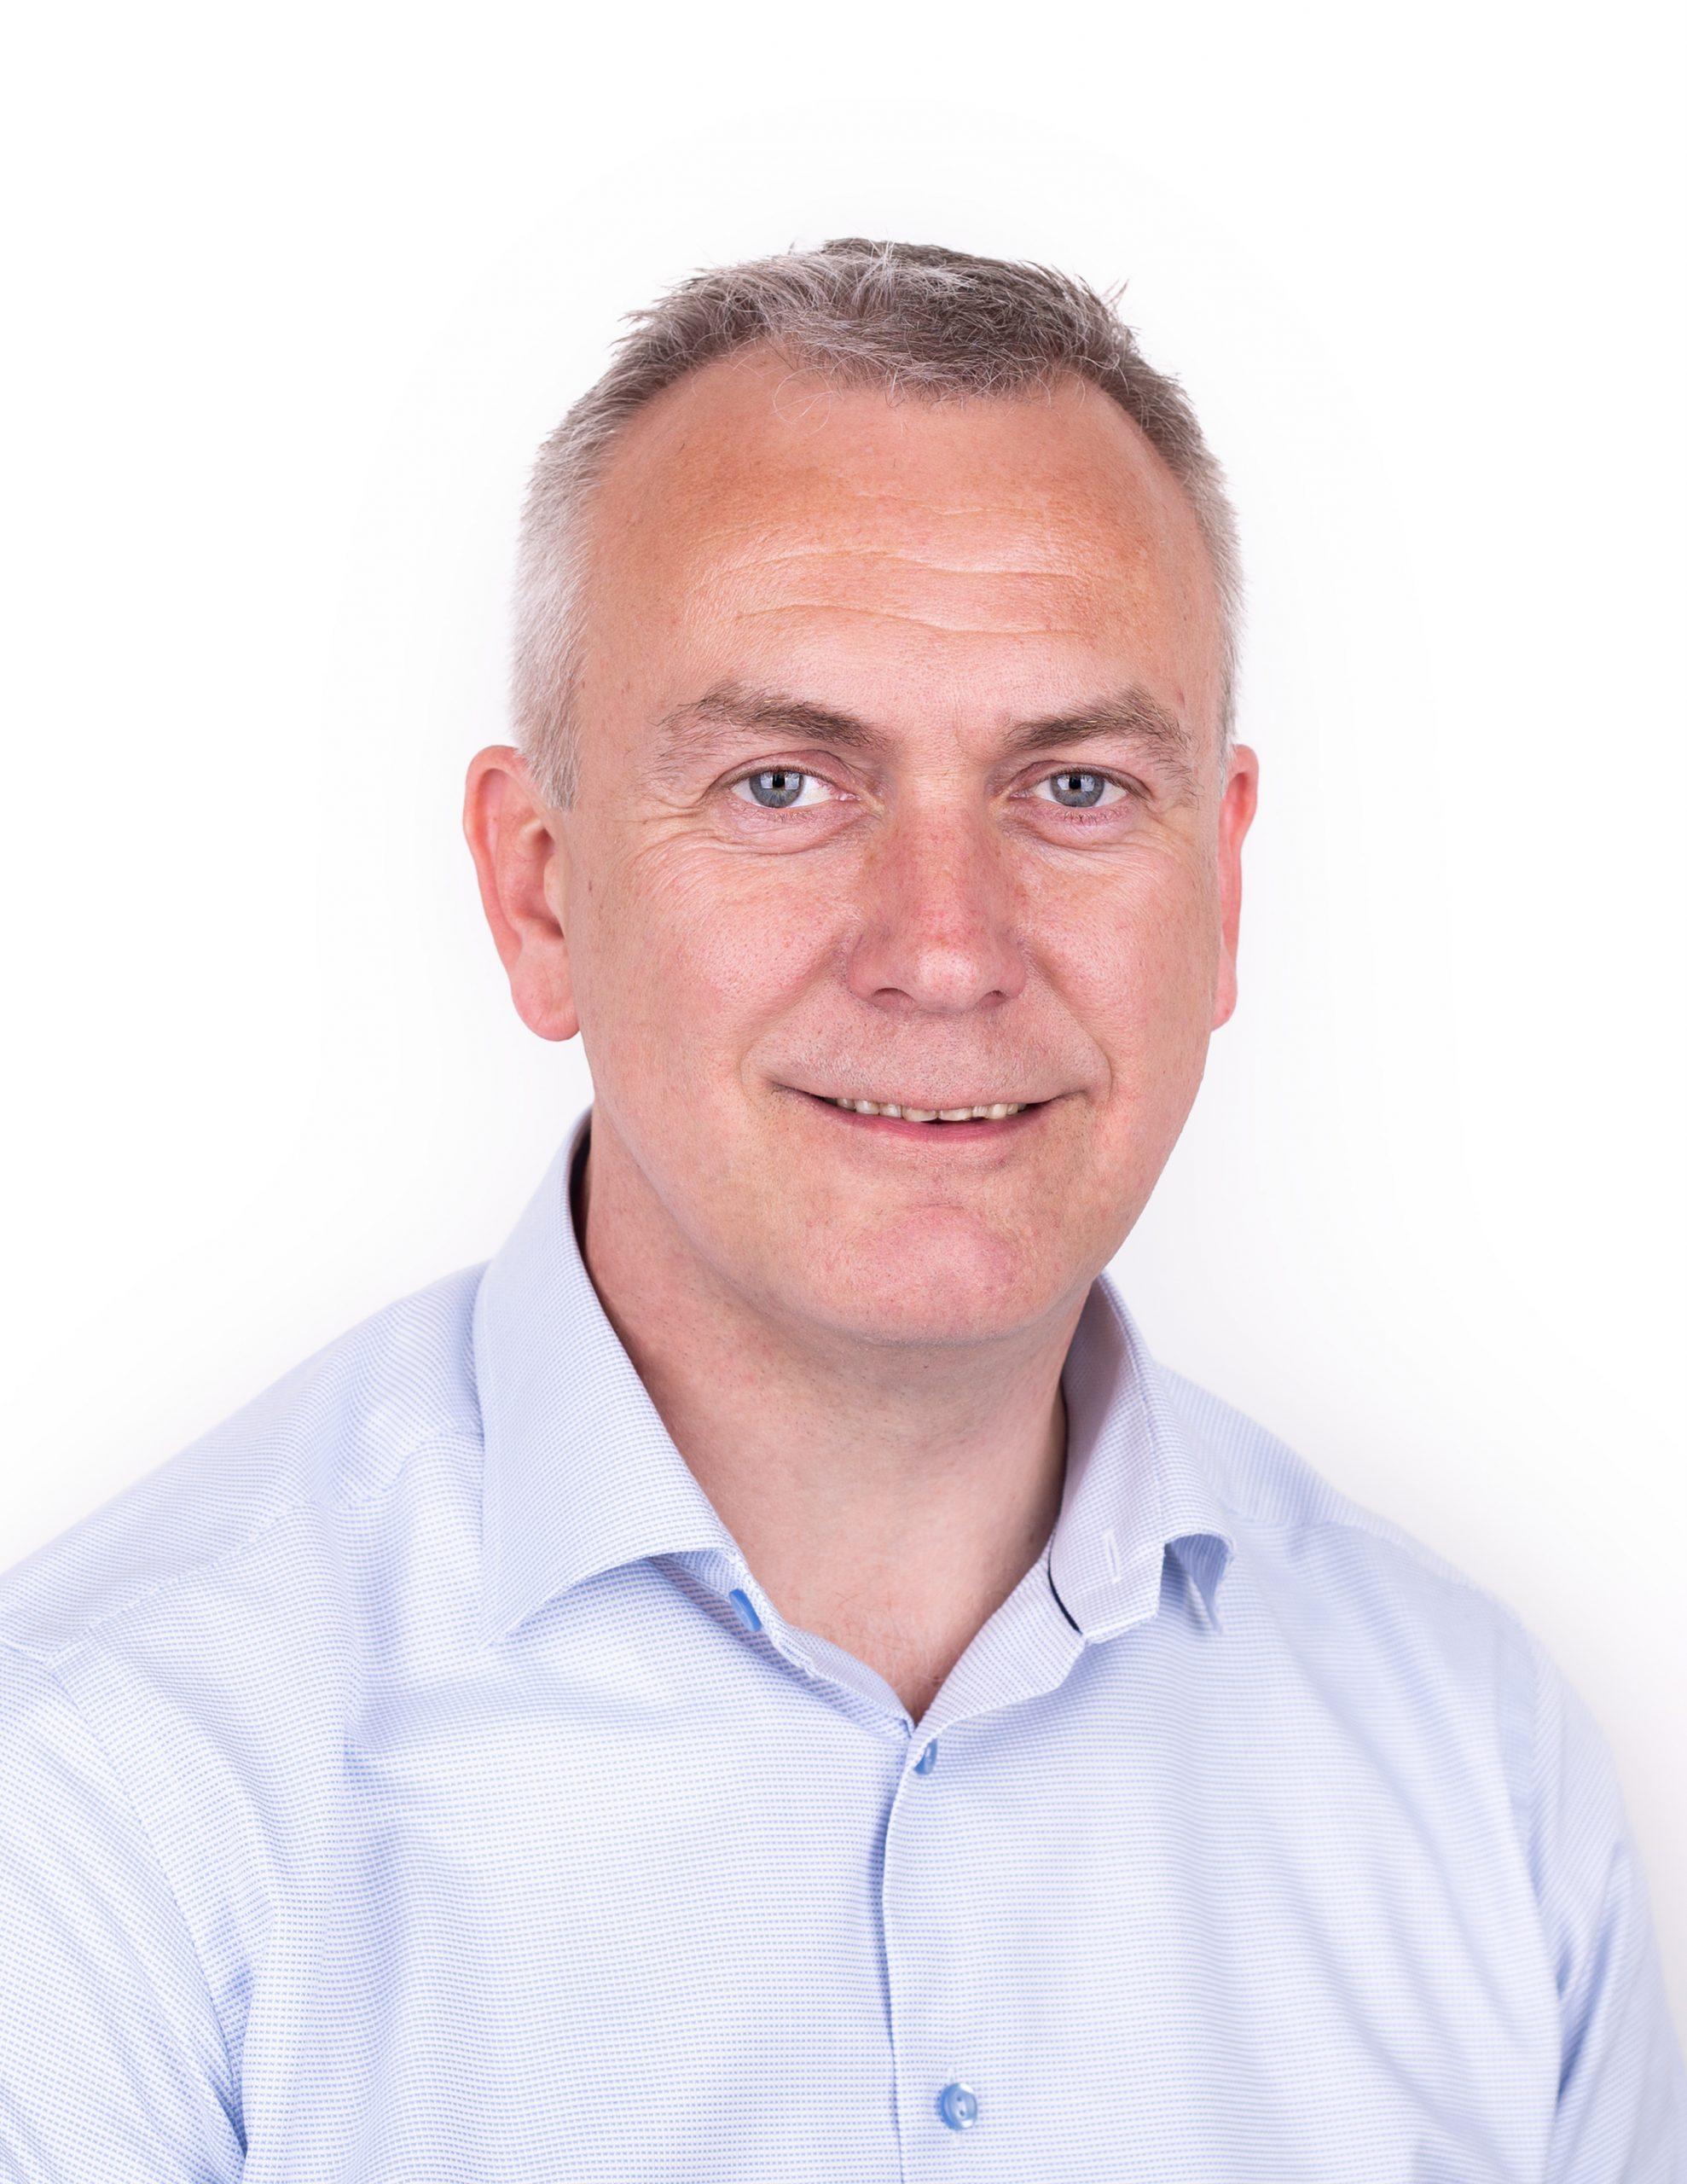 Peter Odgaard-Jensen, CEO